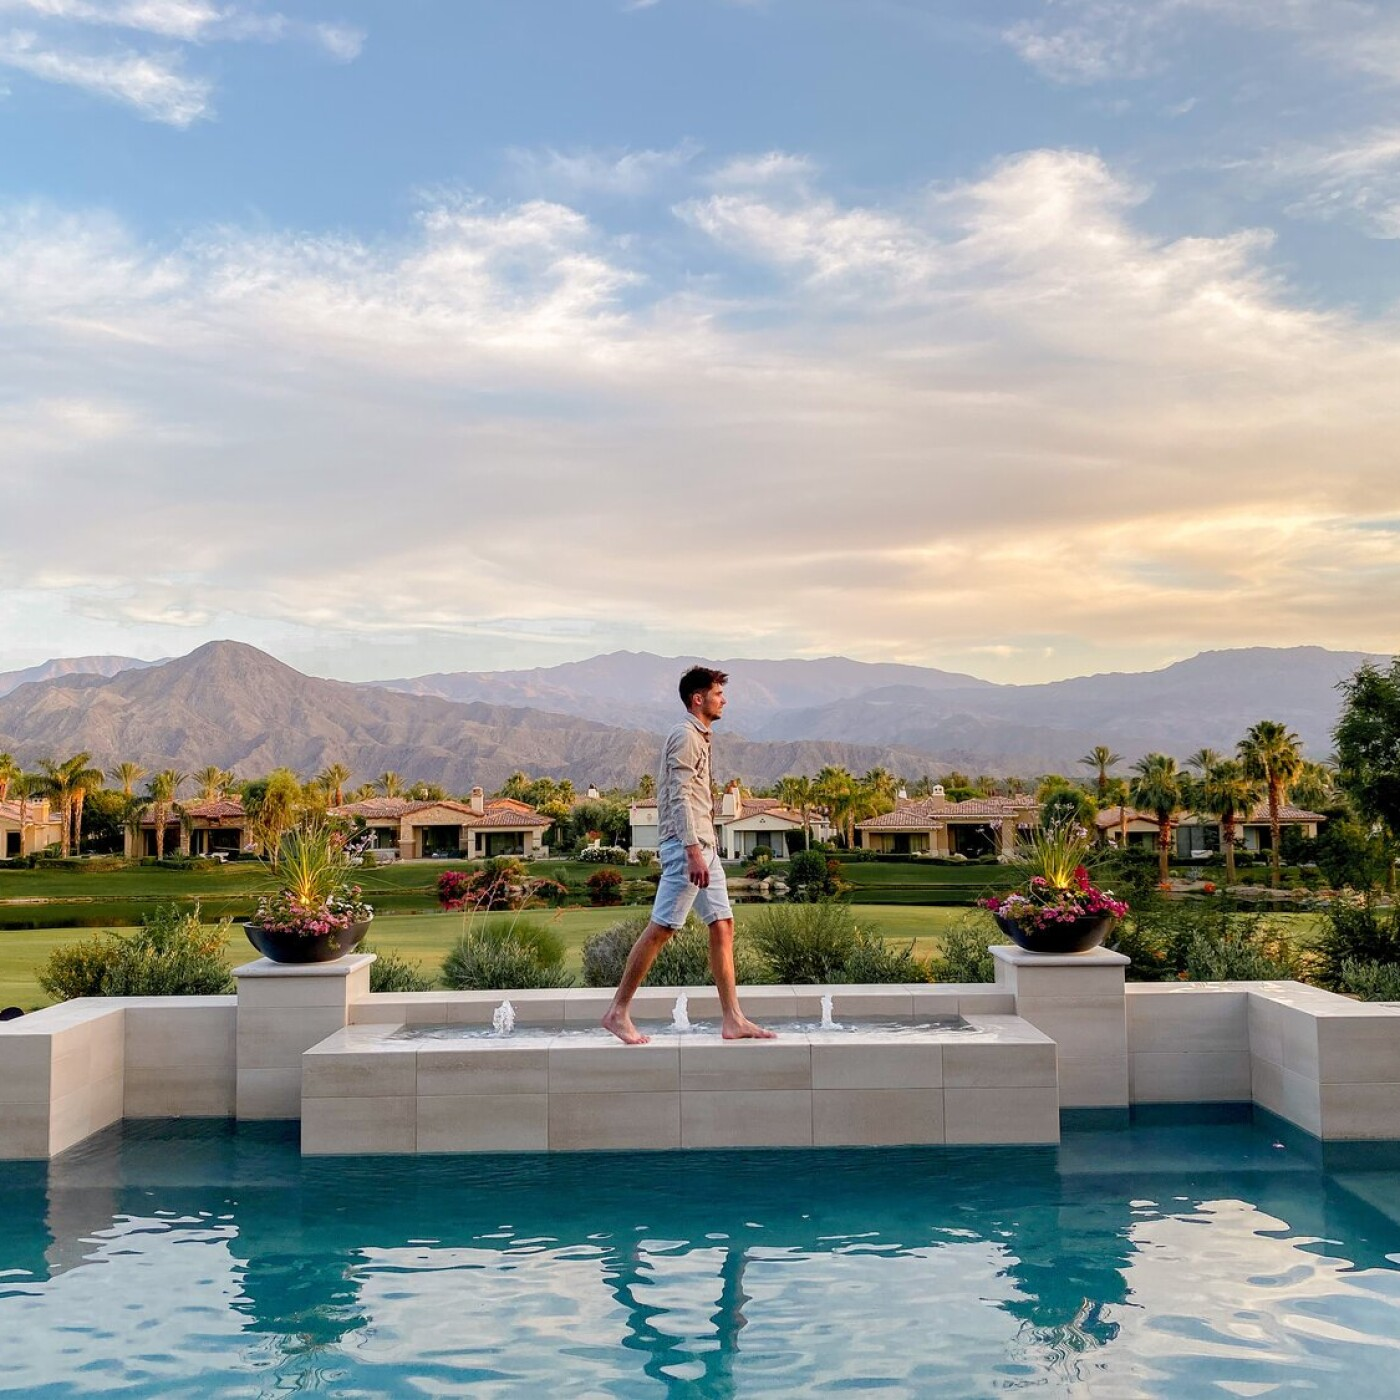 A 25 ans, Logan est installé à Palm Springs, USA, ou il est Swimming pool designer - 07 10 2021 - StereoChic Radio